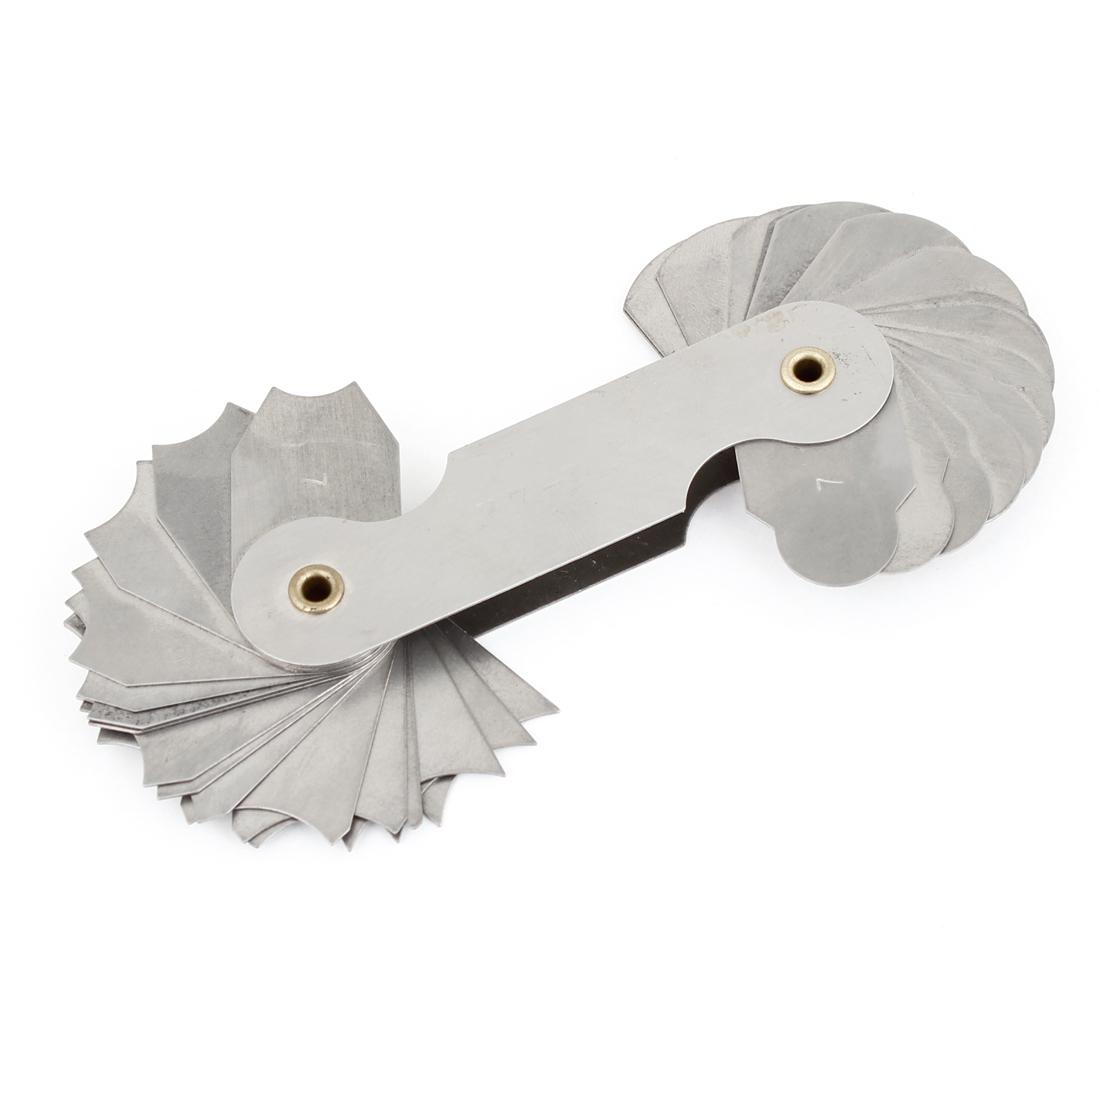 R7-14.5mm Pocket Measure Tool 32 Leaves Radius Gauge Gage